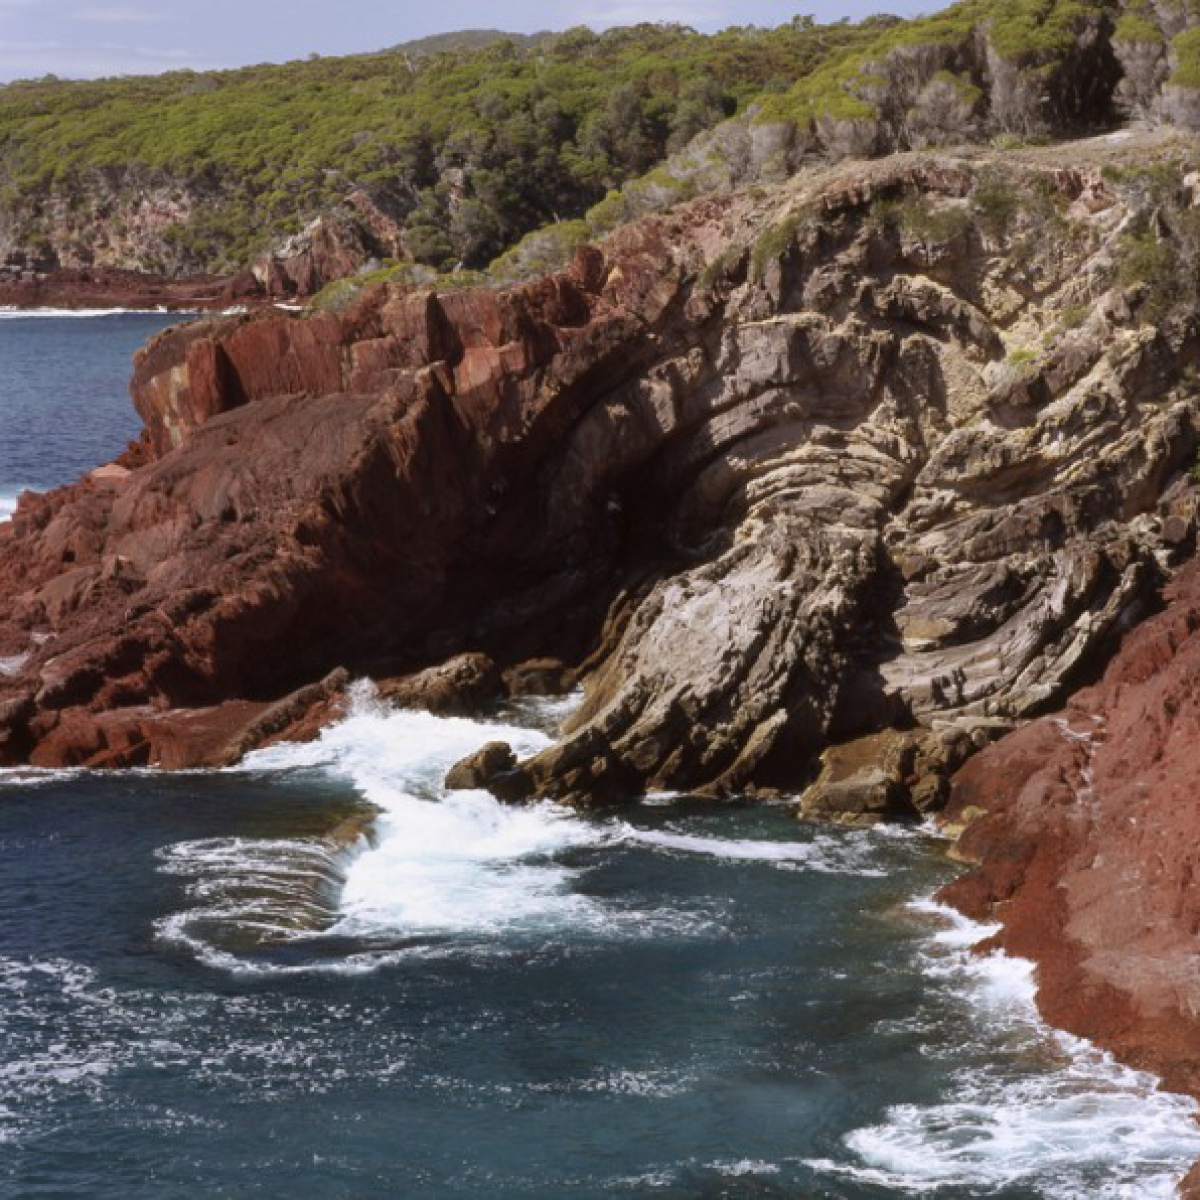 Folded rock strata - Ben Boyd National Park